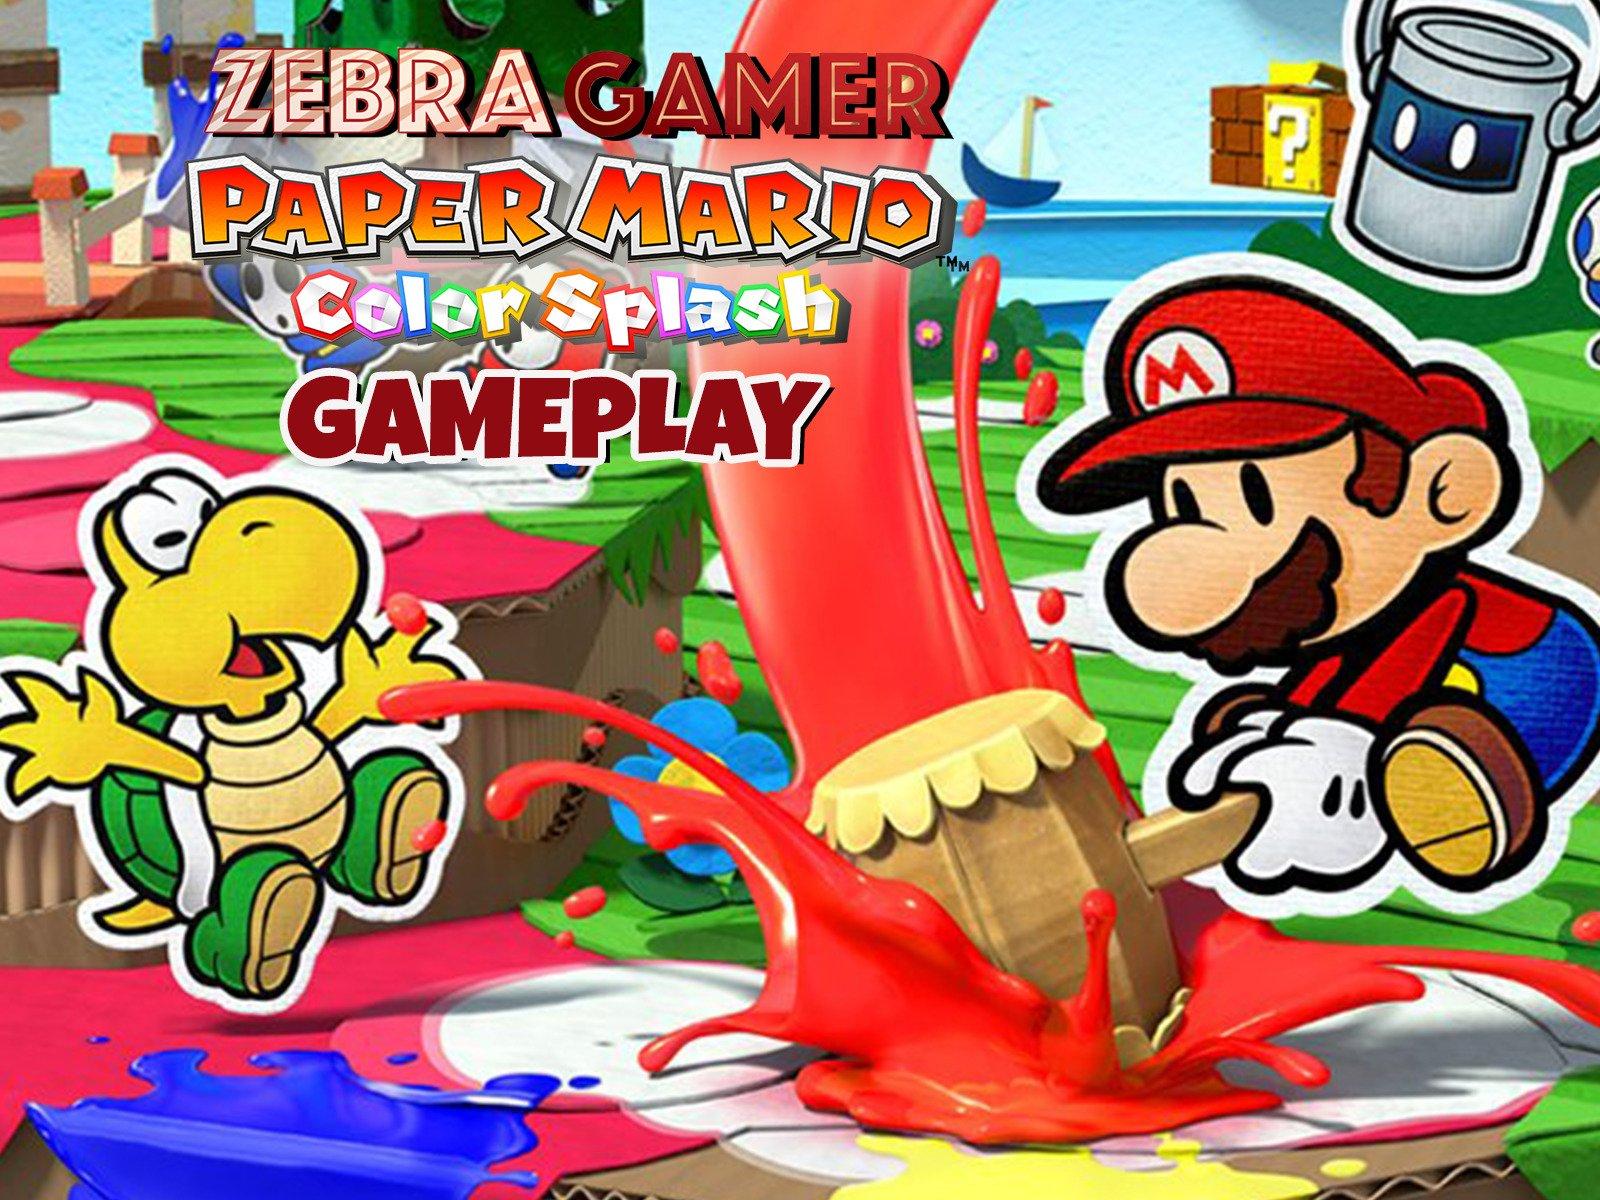 Amazon.com: Paper Mario Color Splash Gameplay - Zebra Gamer ...